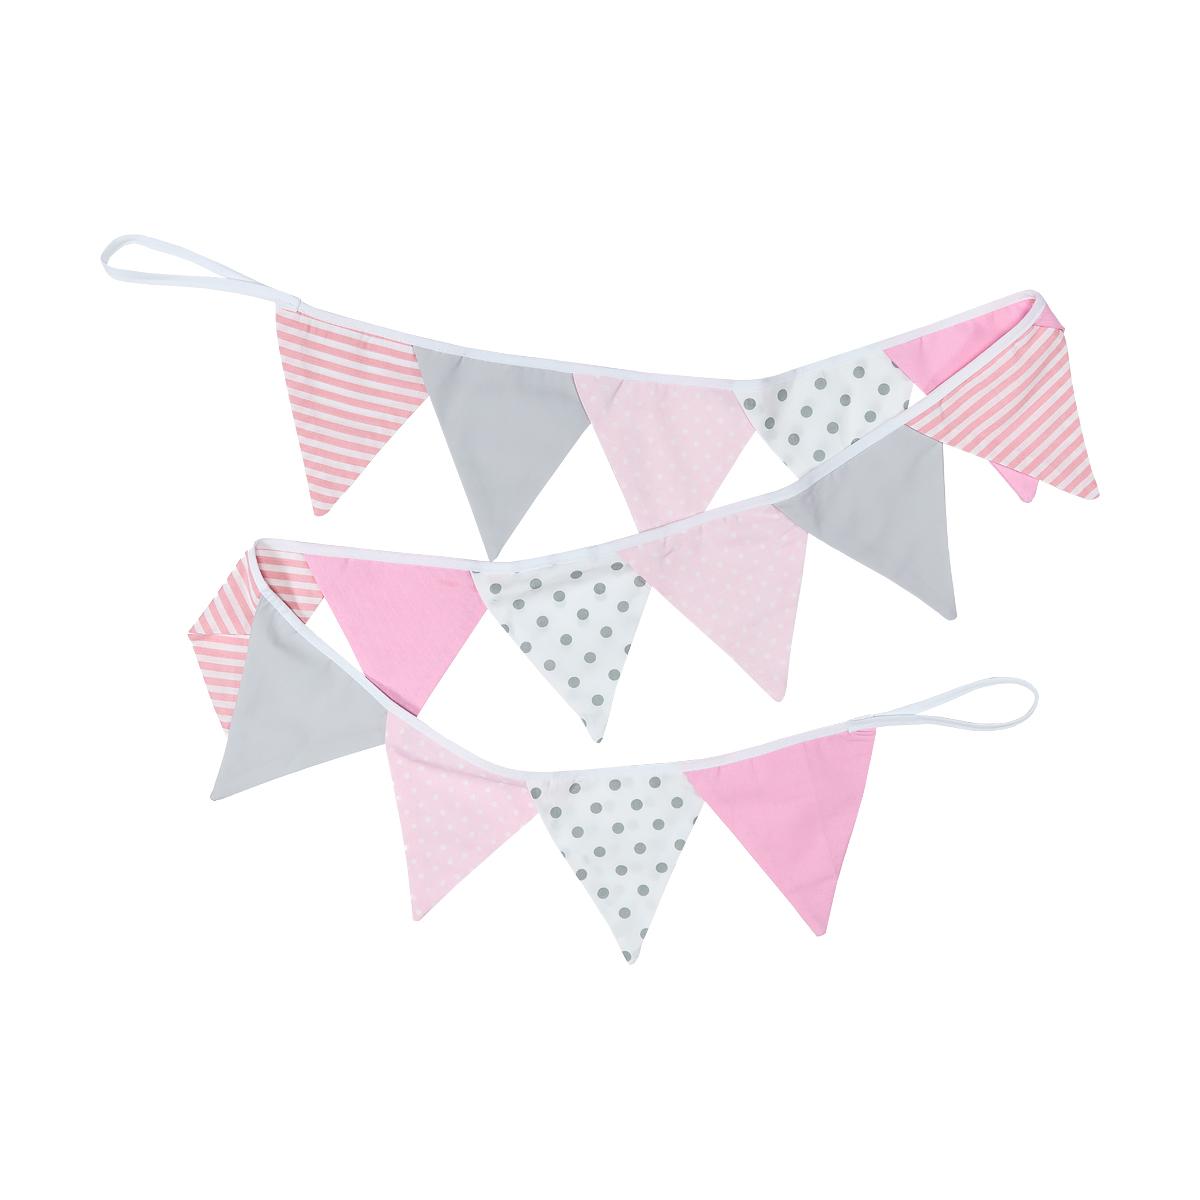 Kraftkids dekoration wimpelkette rosa grau weiss for Kinderzimmer rosa grau